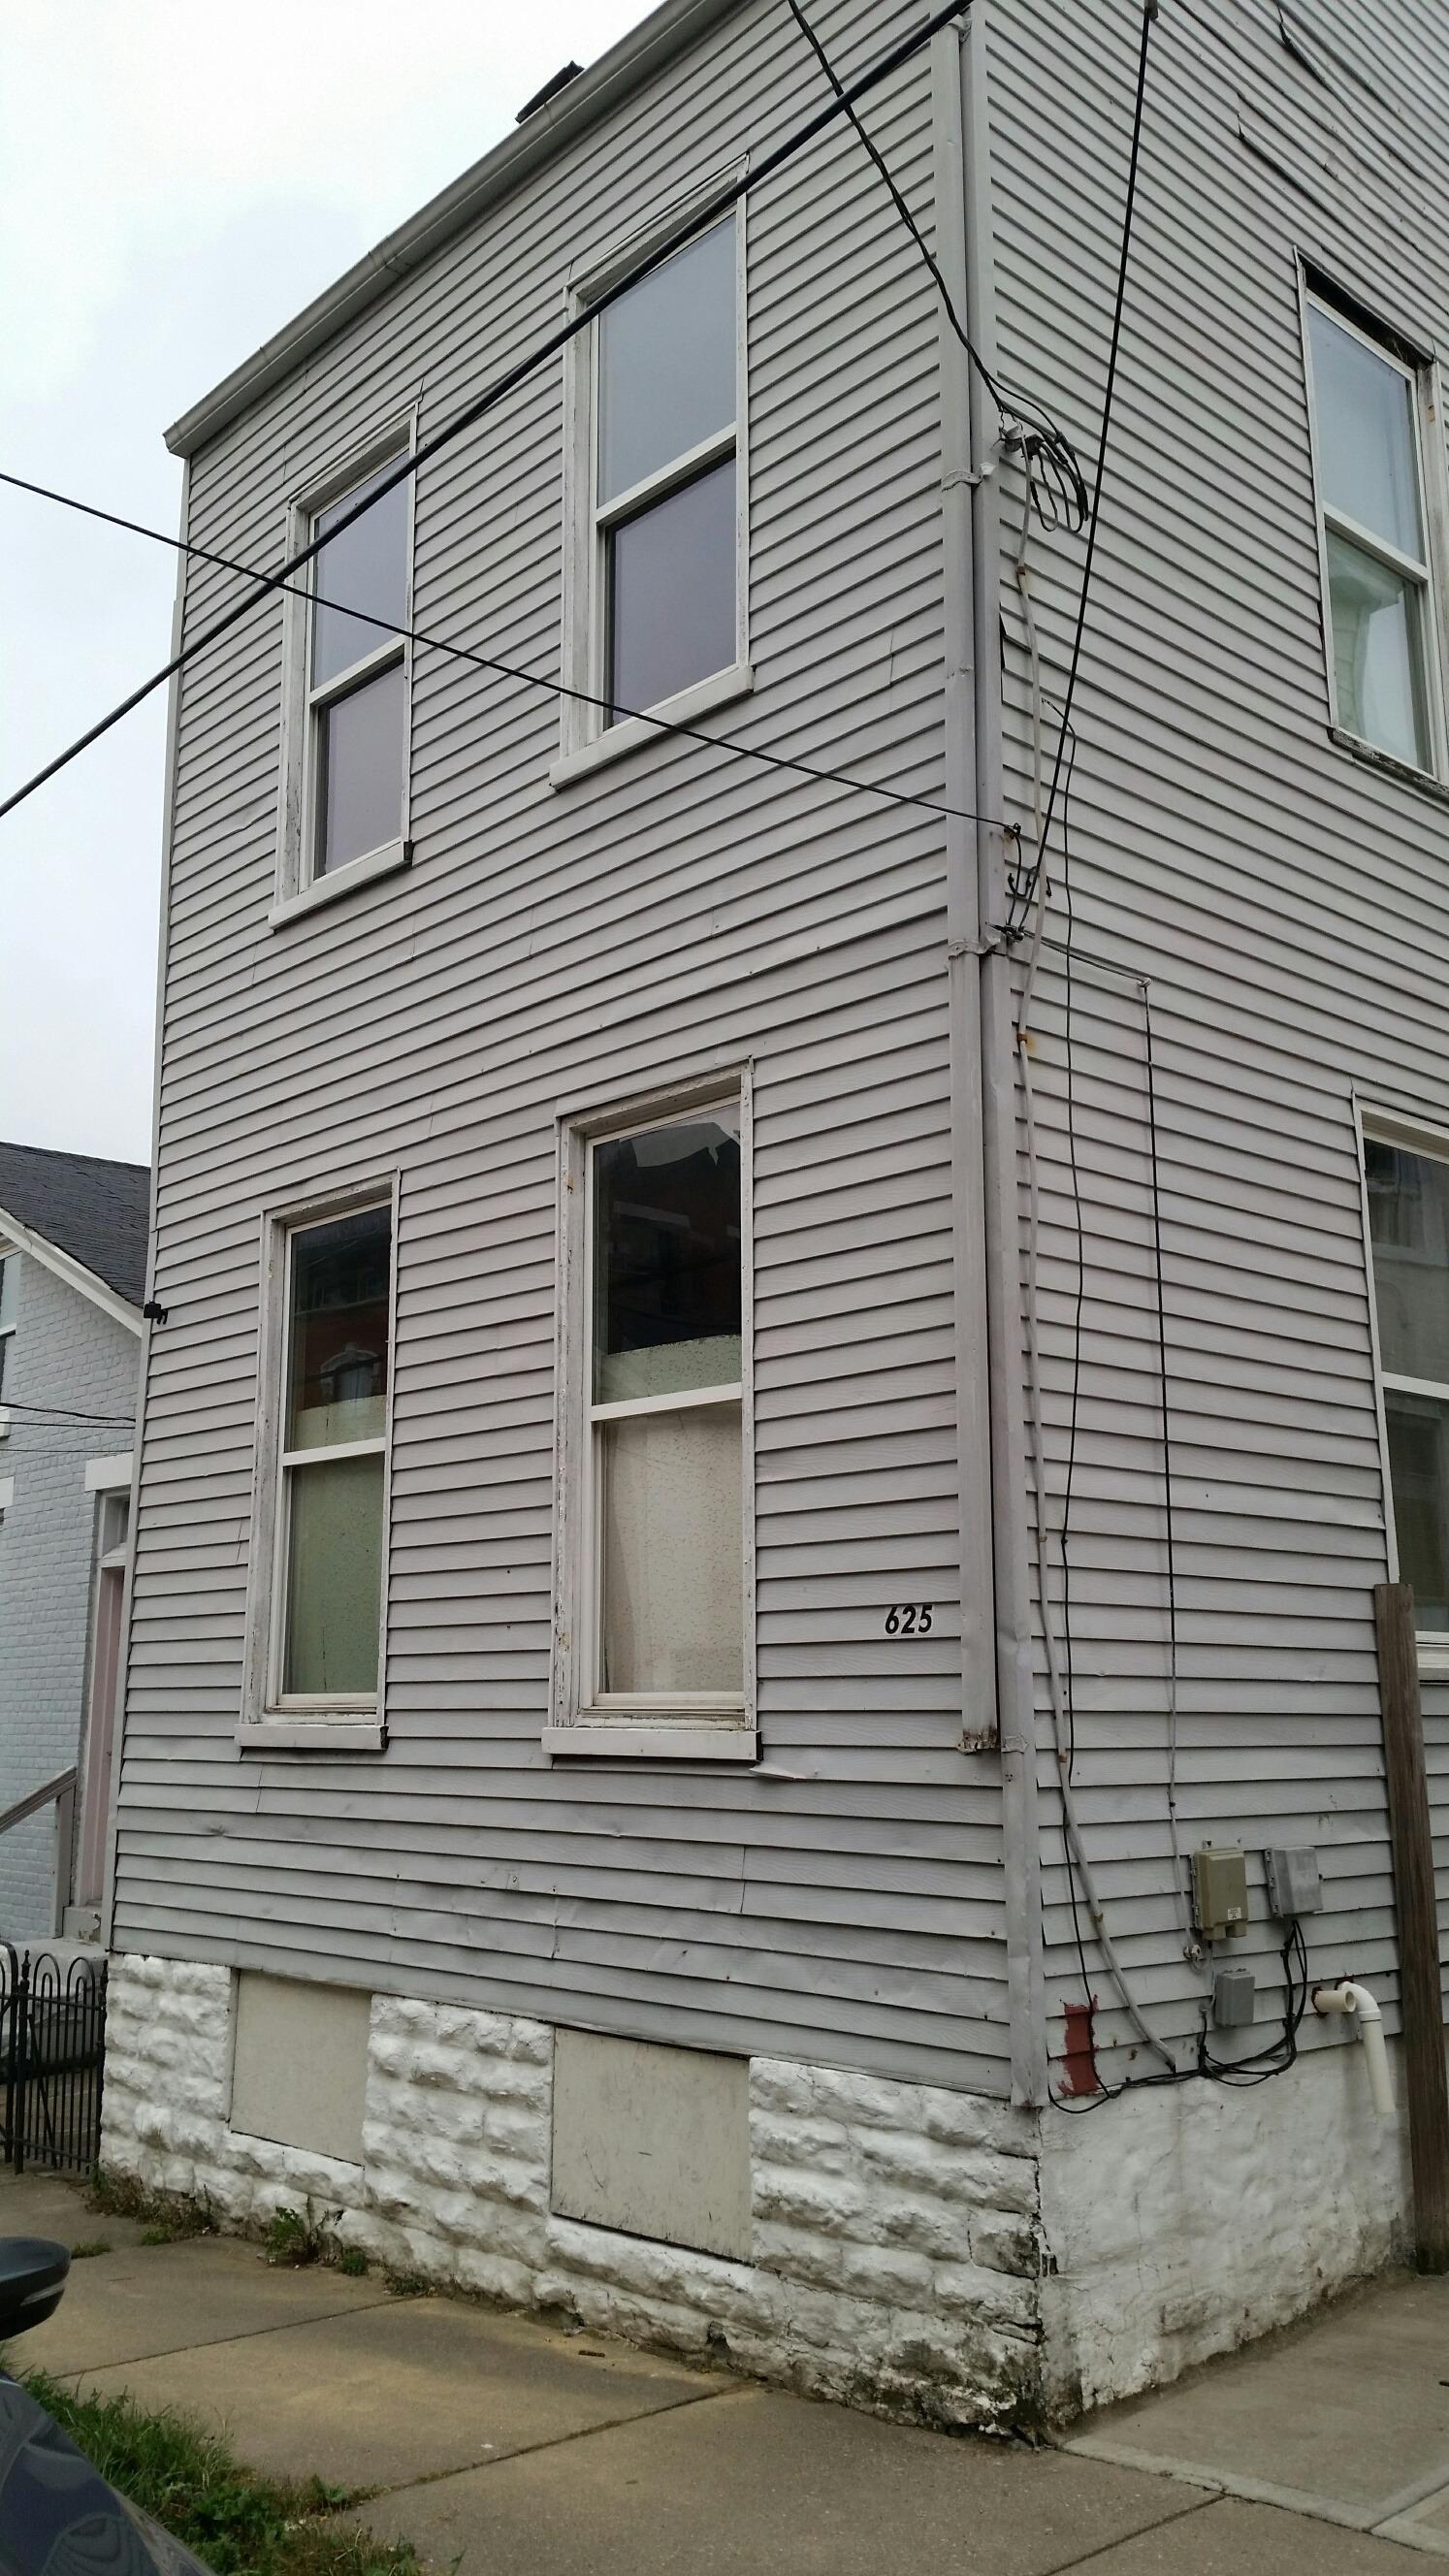 Rental Homes for Rent, ListingId:35604297, location: 625 West 11th Street Covington 41011